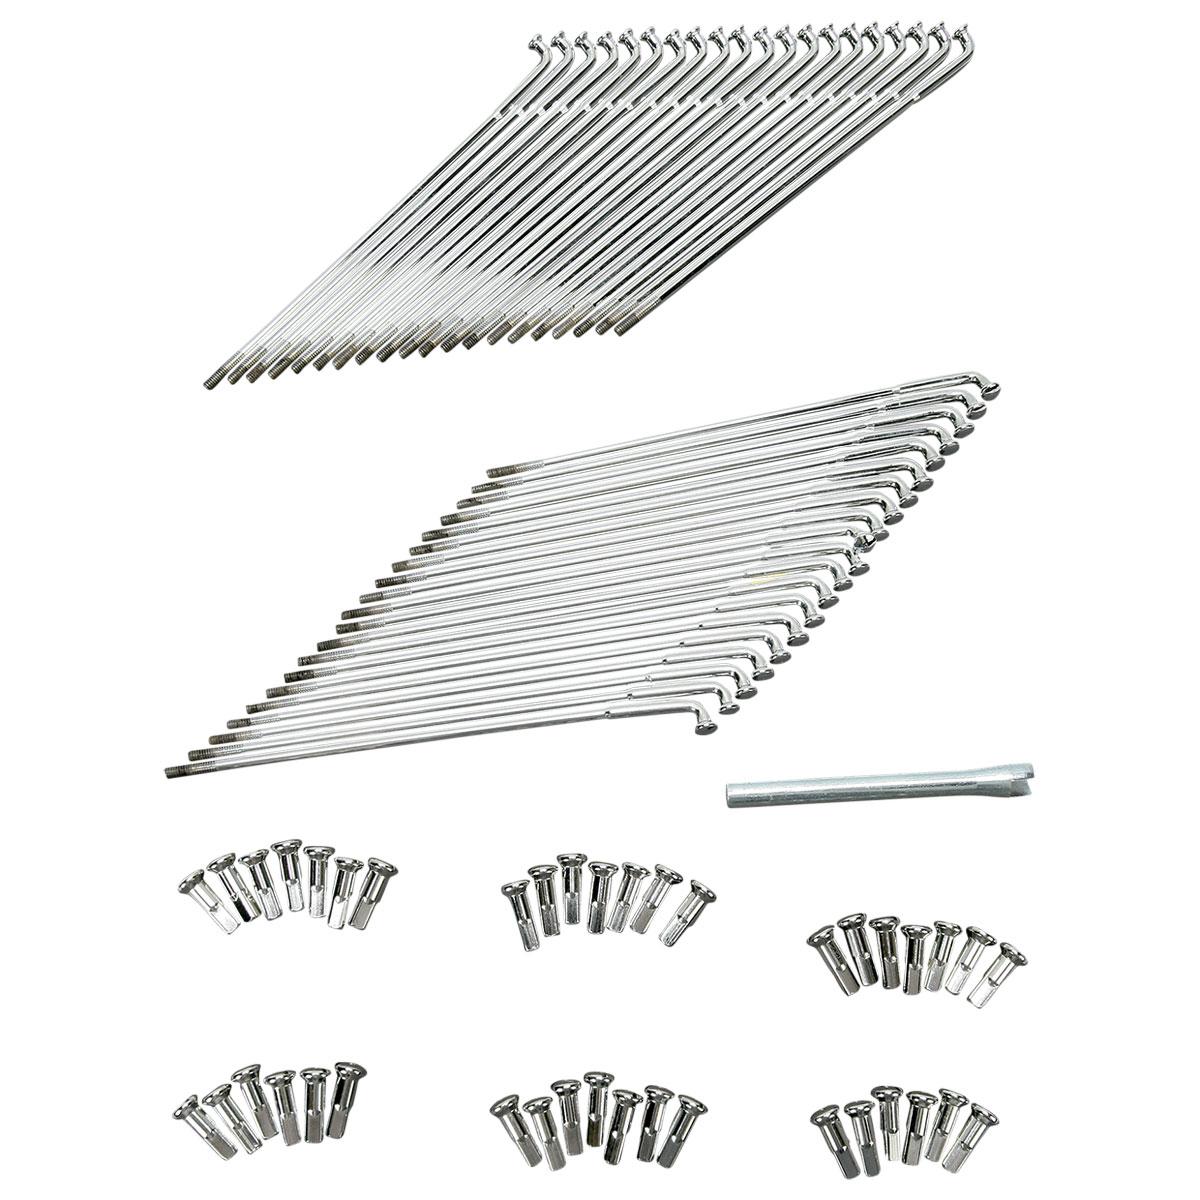 Drag Specialties Spoke Set for Spun Steel Hub 21